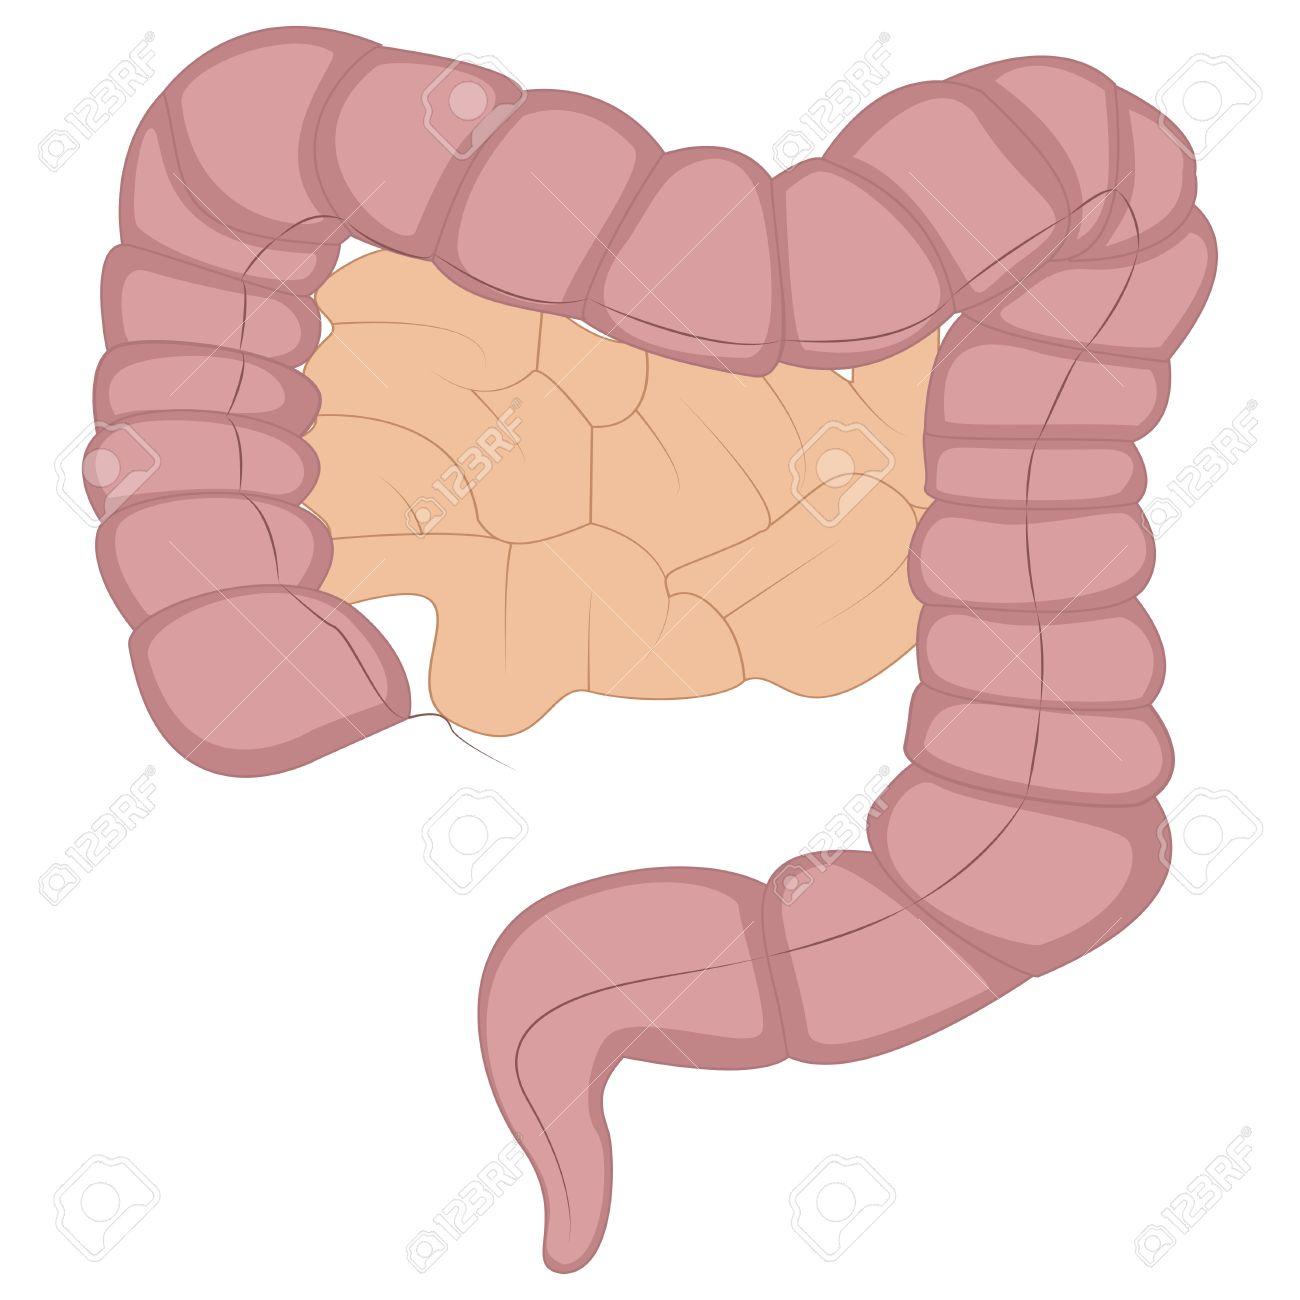 illustration of intestine cartoon royalty free cliparts vectors